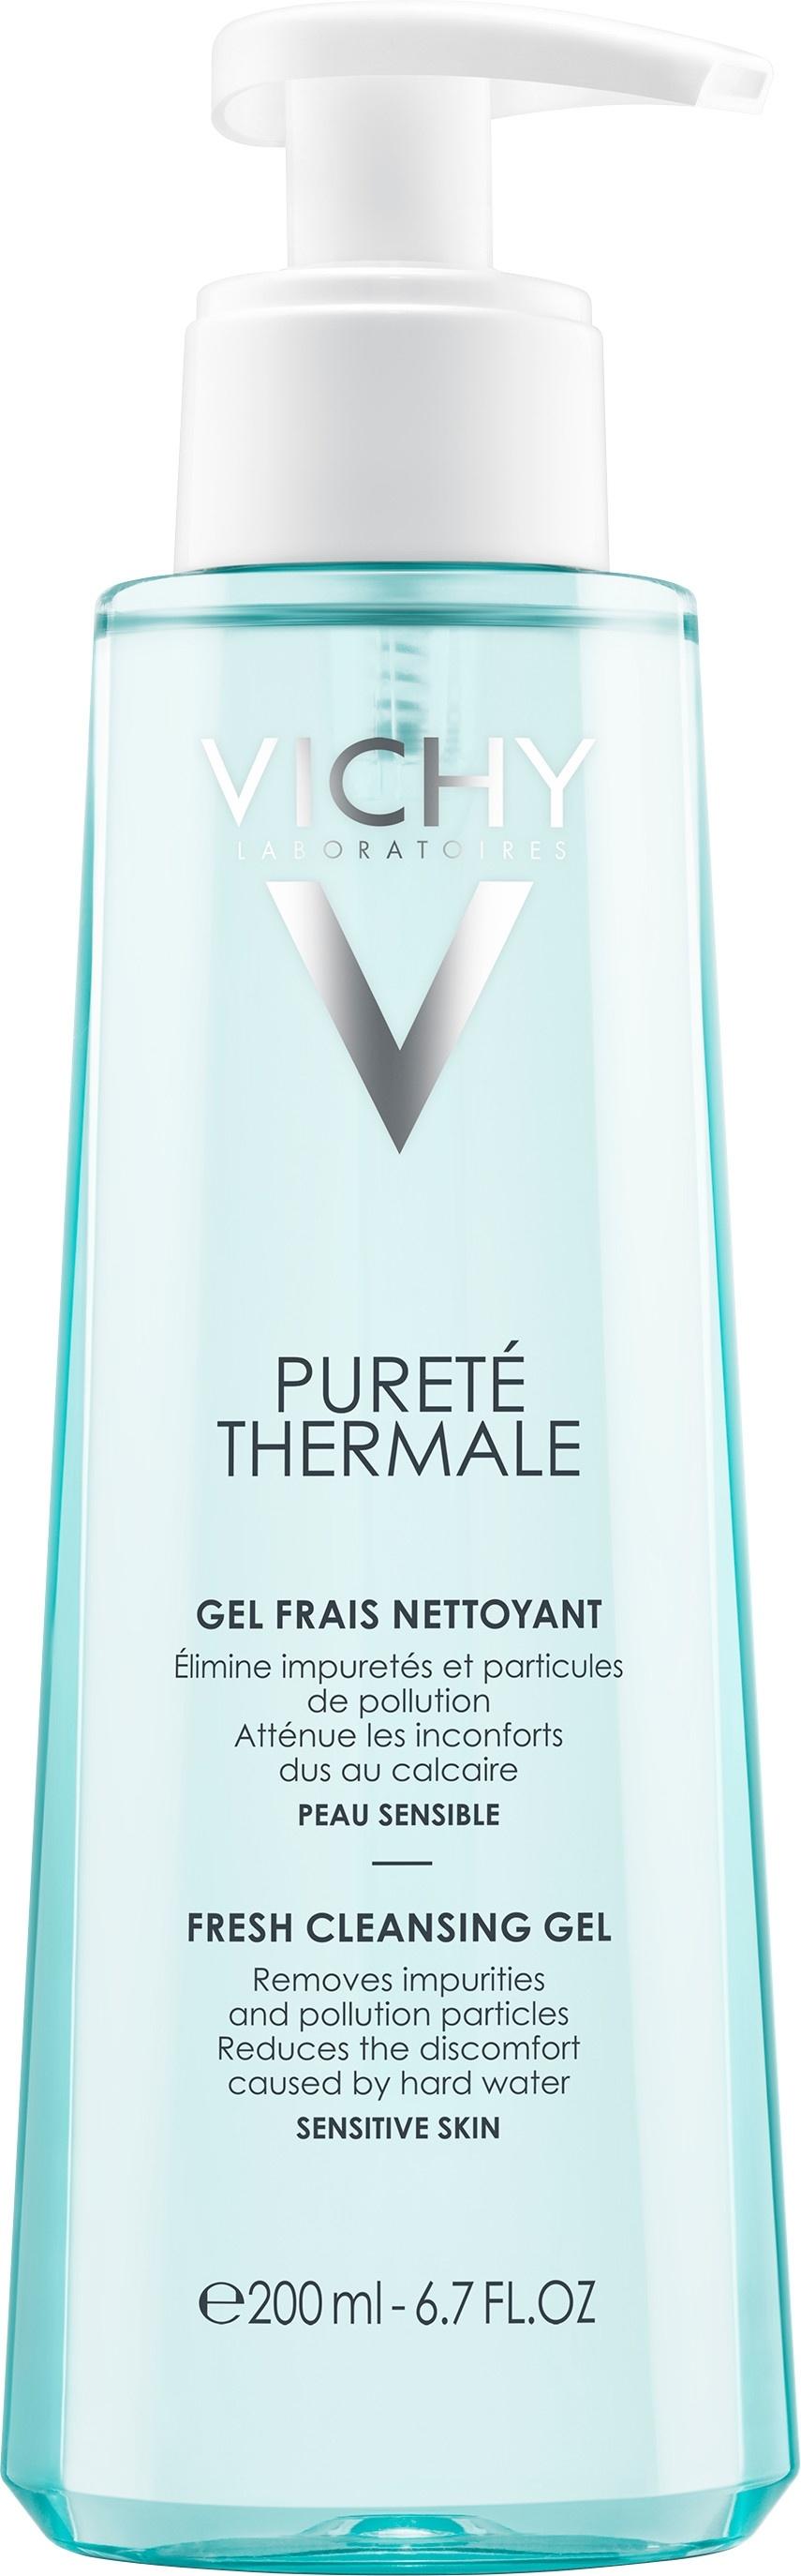 Vichy Purete Thermale Fresh Cleansing Gel 200ml